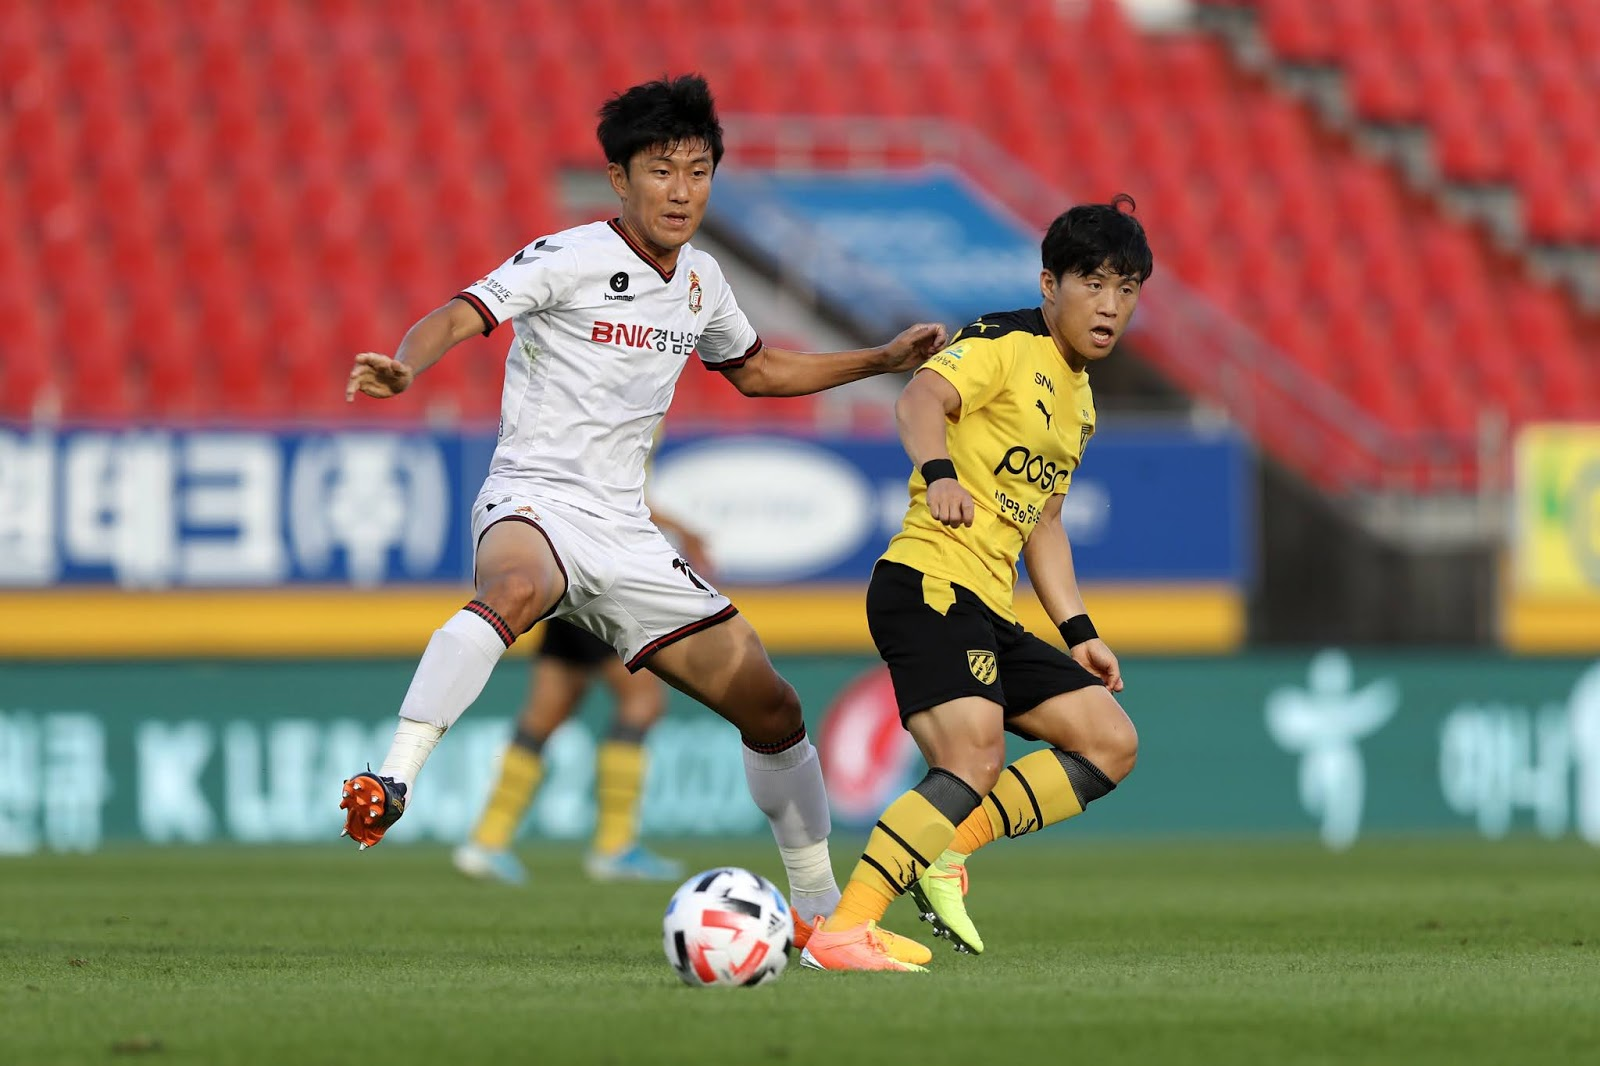 Preview: Jeonnam Dragons vs Gyeongnam FC